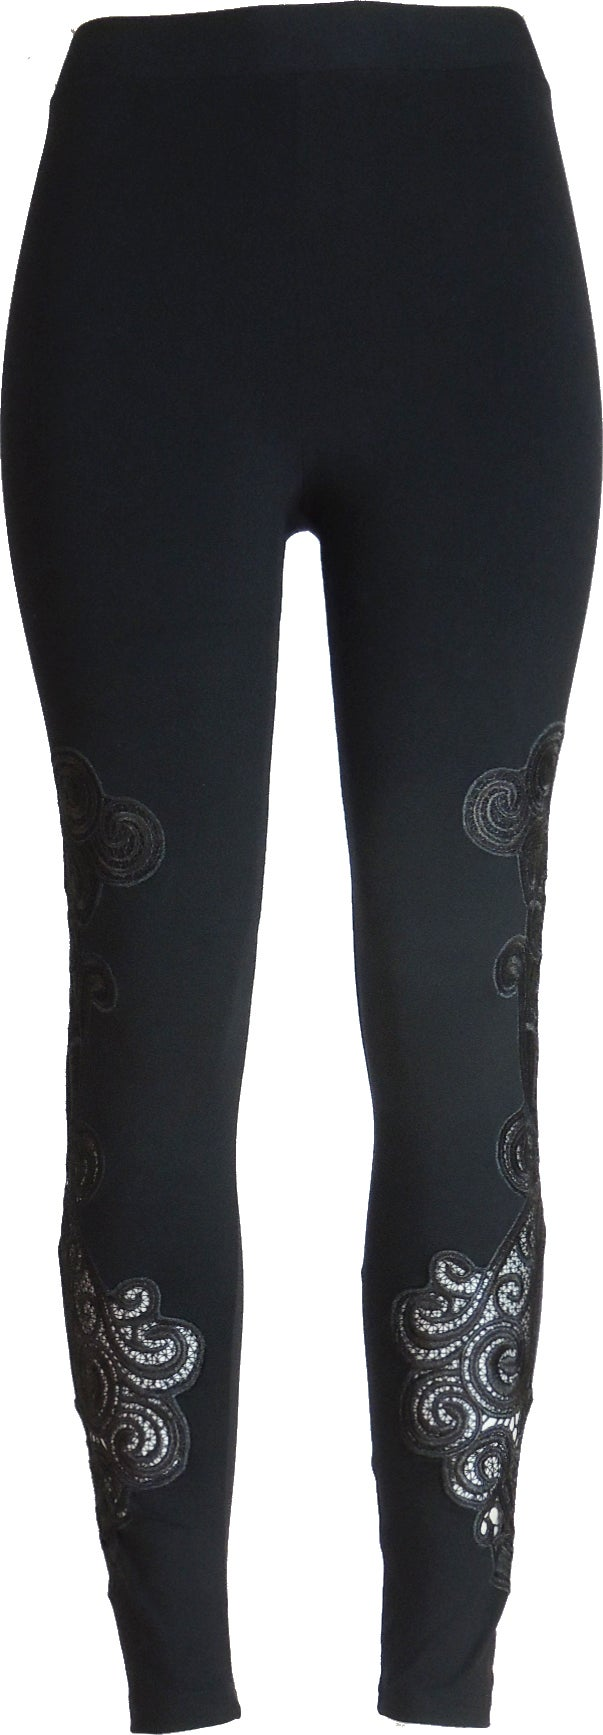 Black round lace FW6017